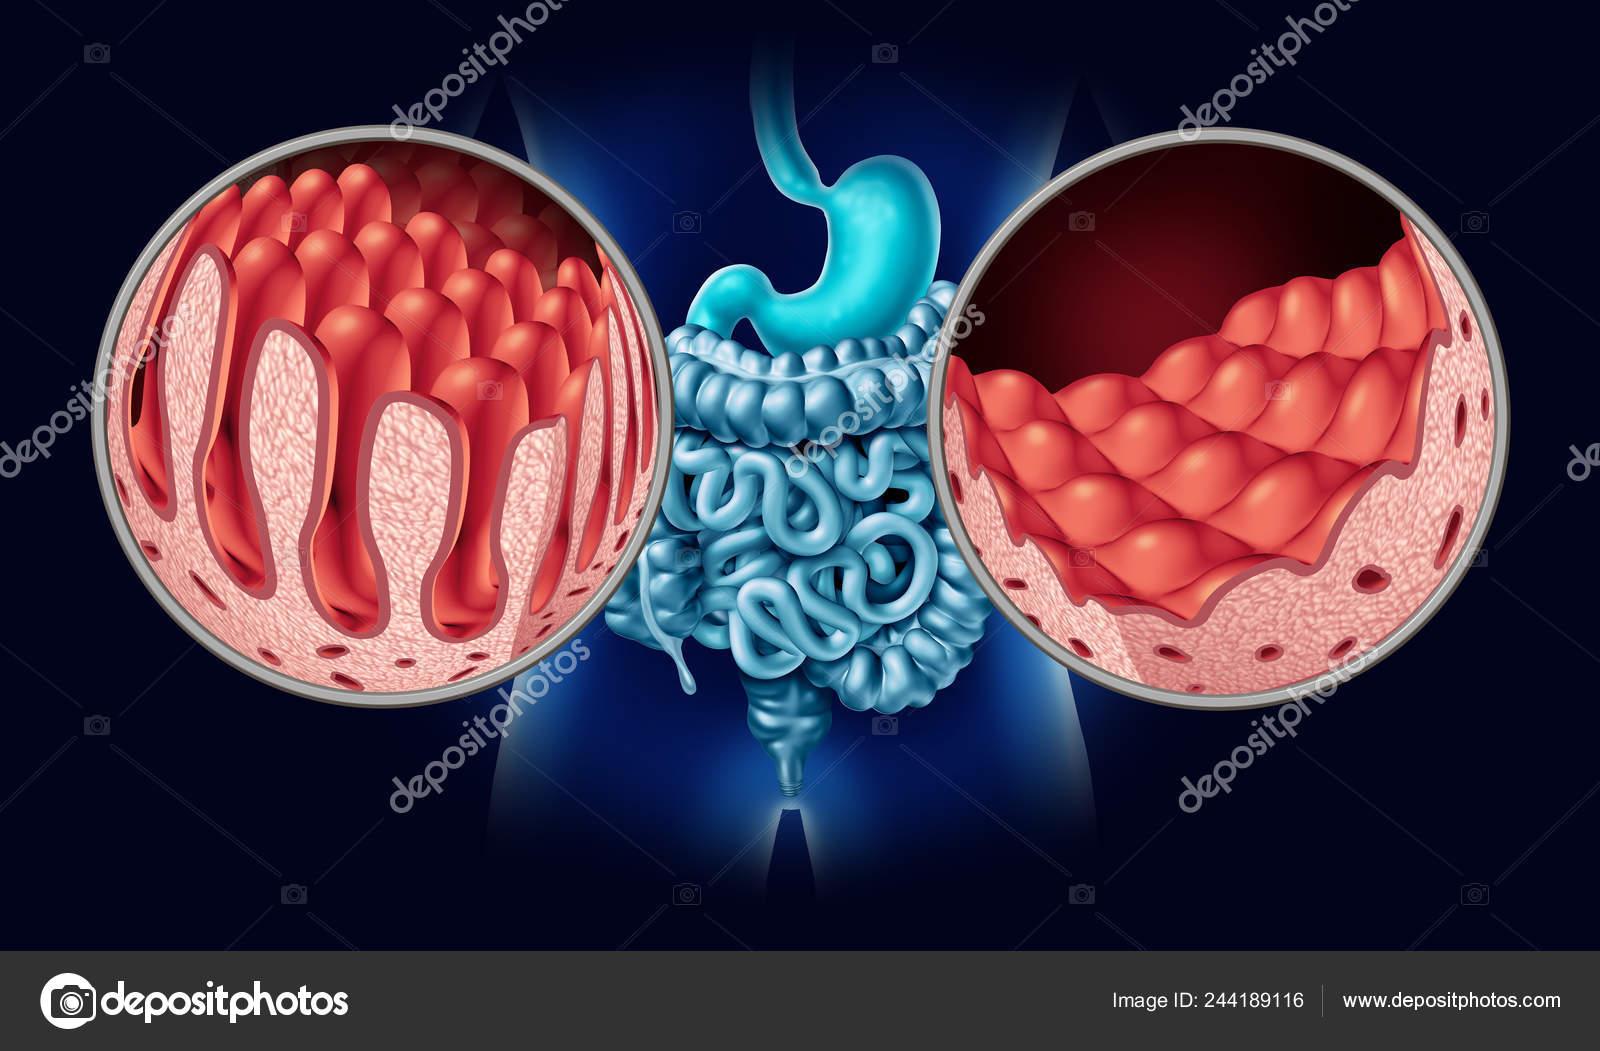 Celiac Coeliac Disease Intestine Anatomy Medical Concept Normal